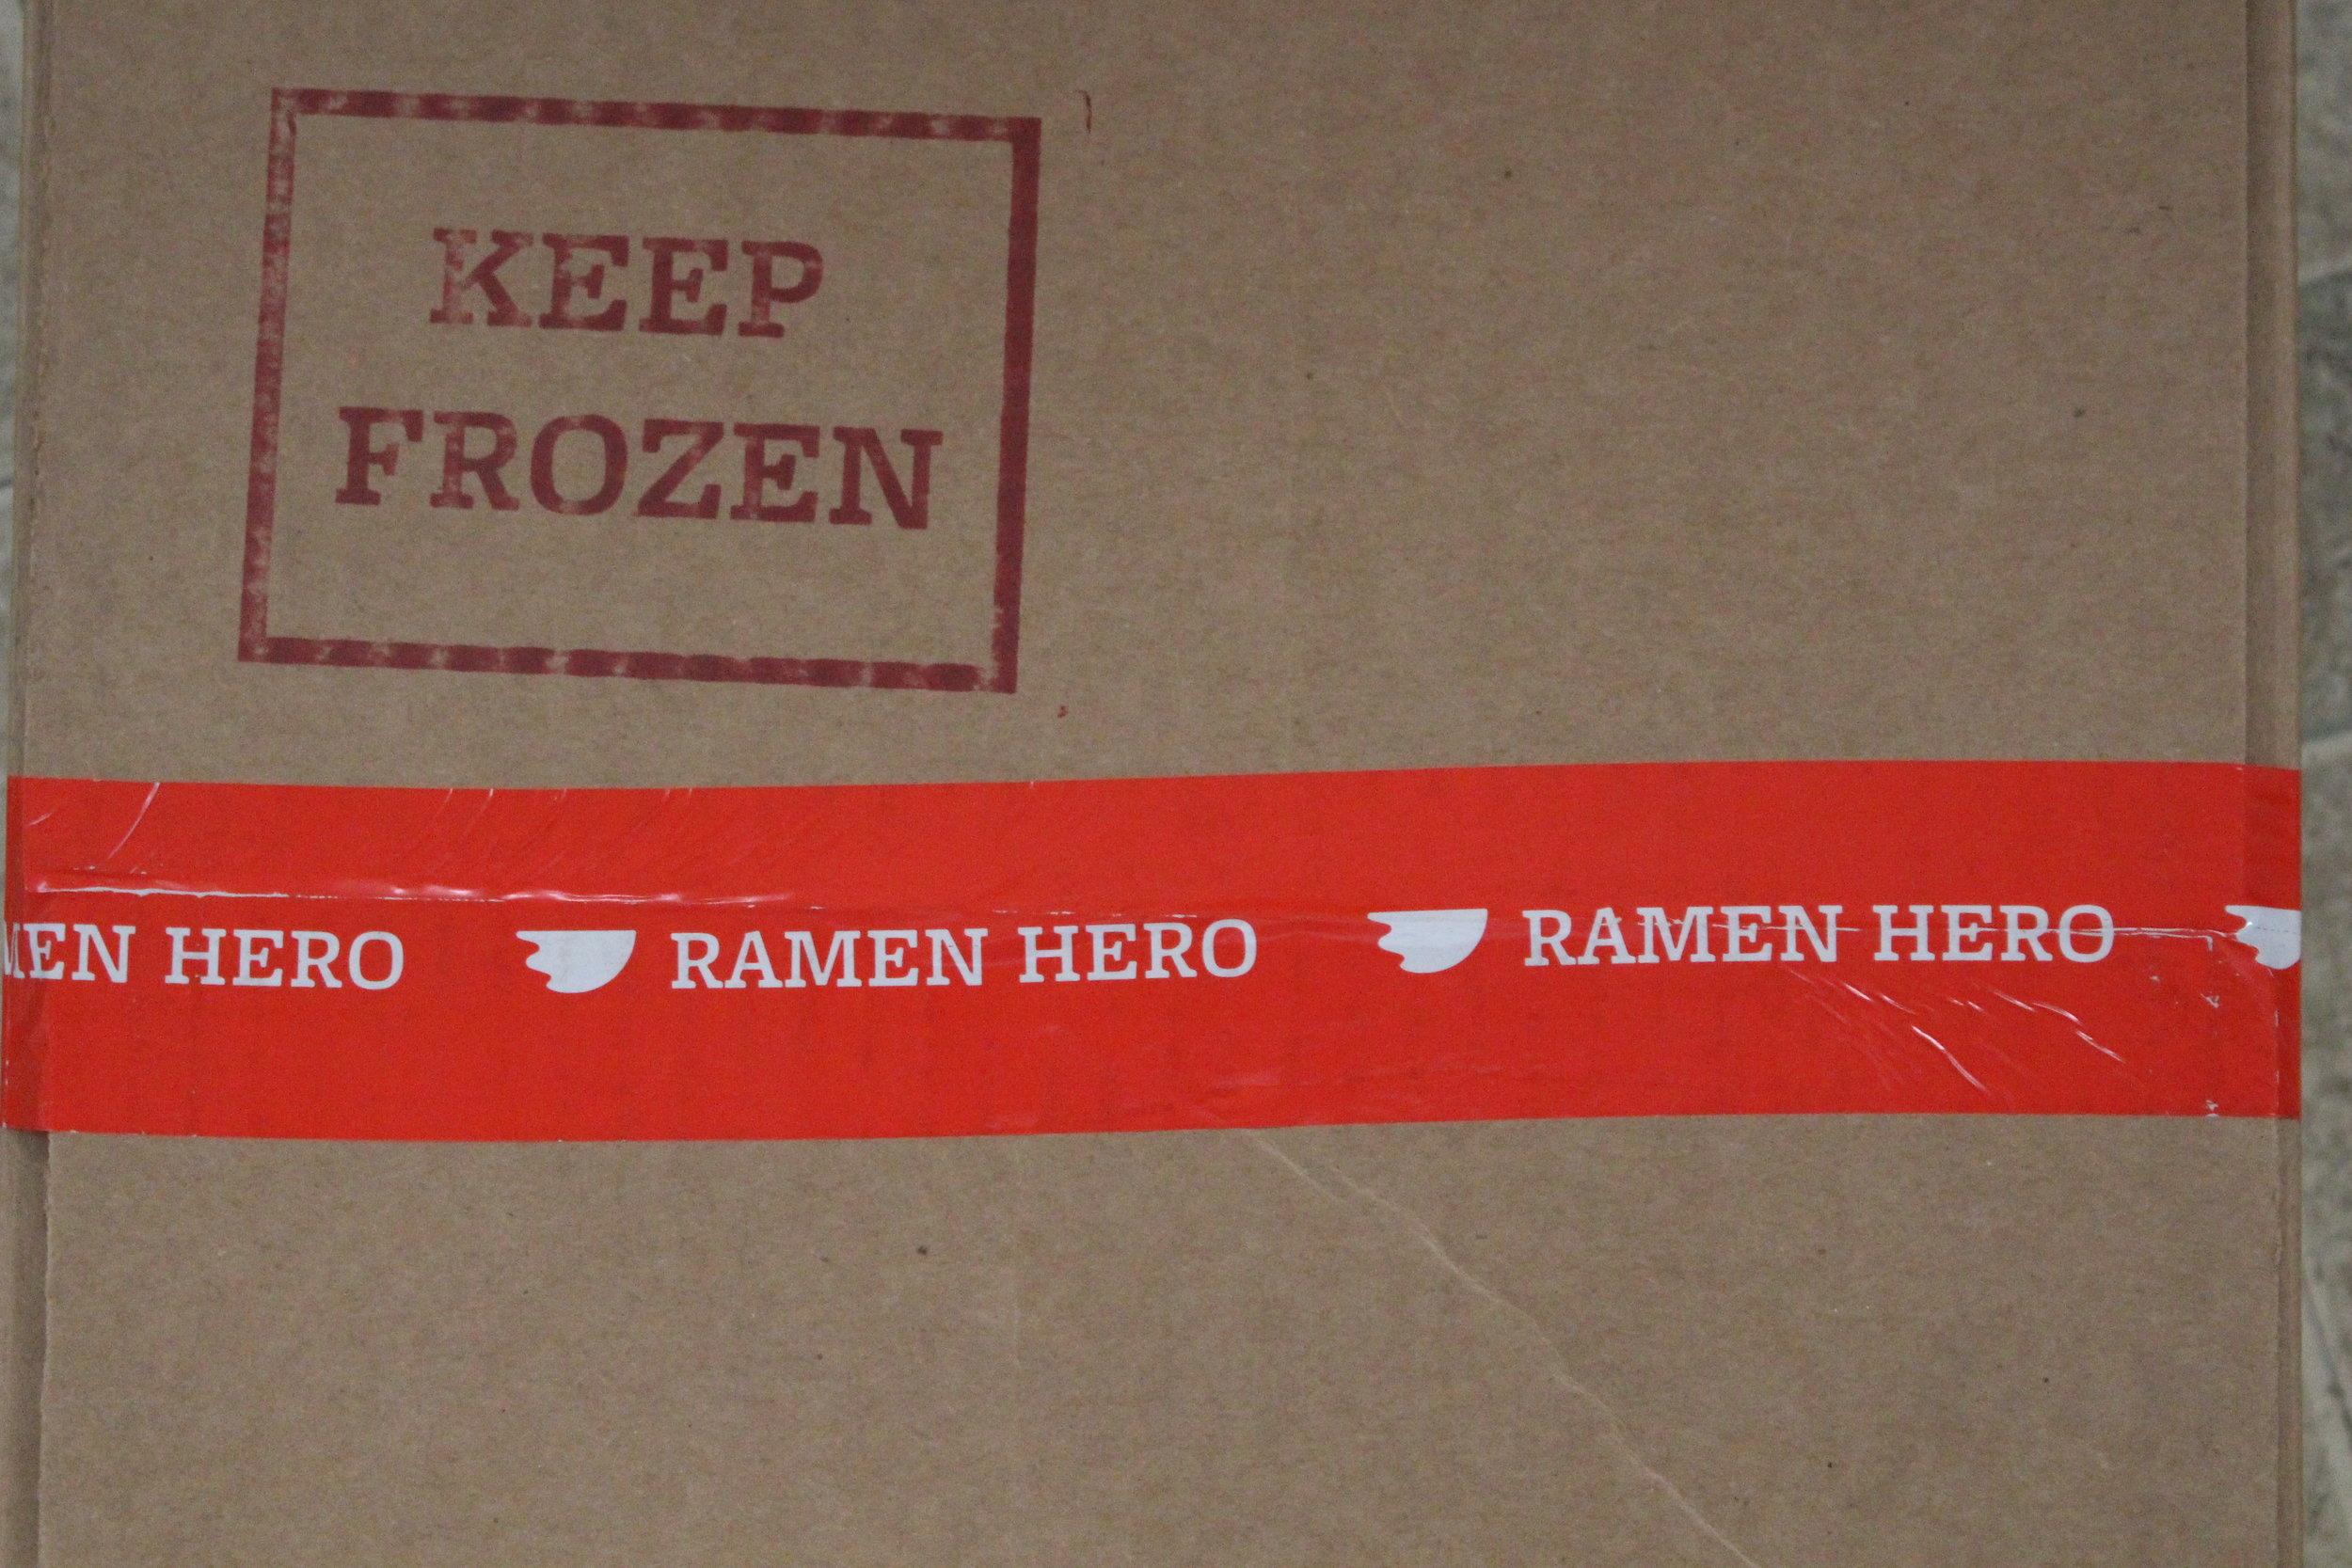 Ramen Hero to the rescue (Tamara Palmer)